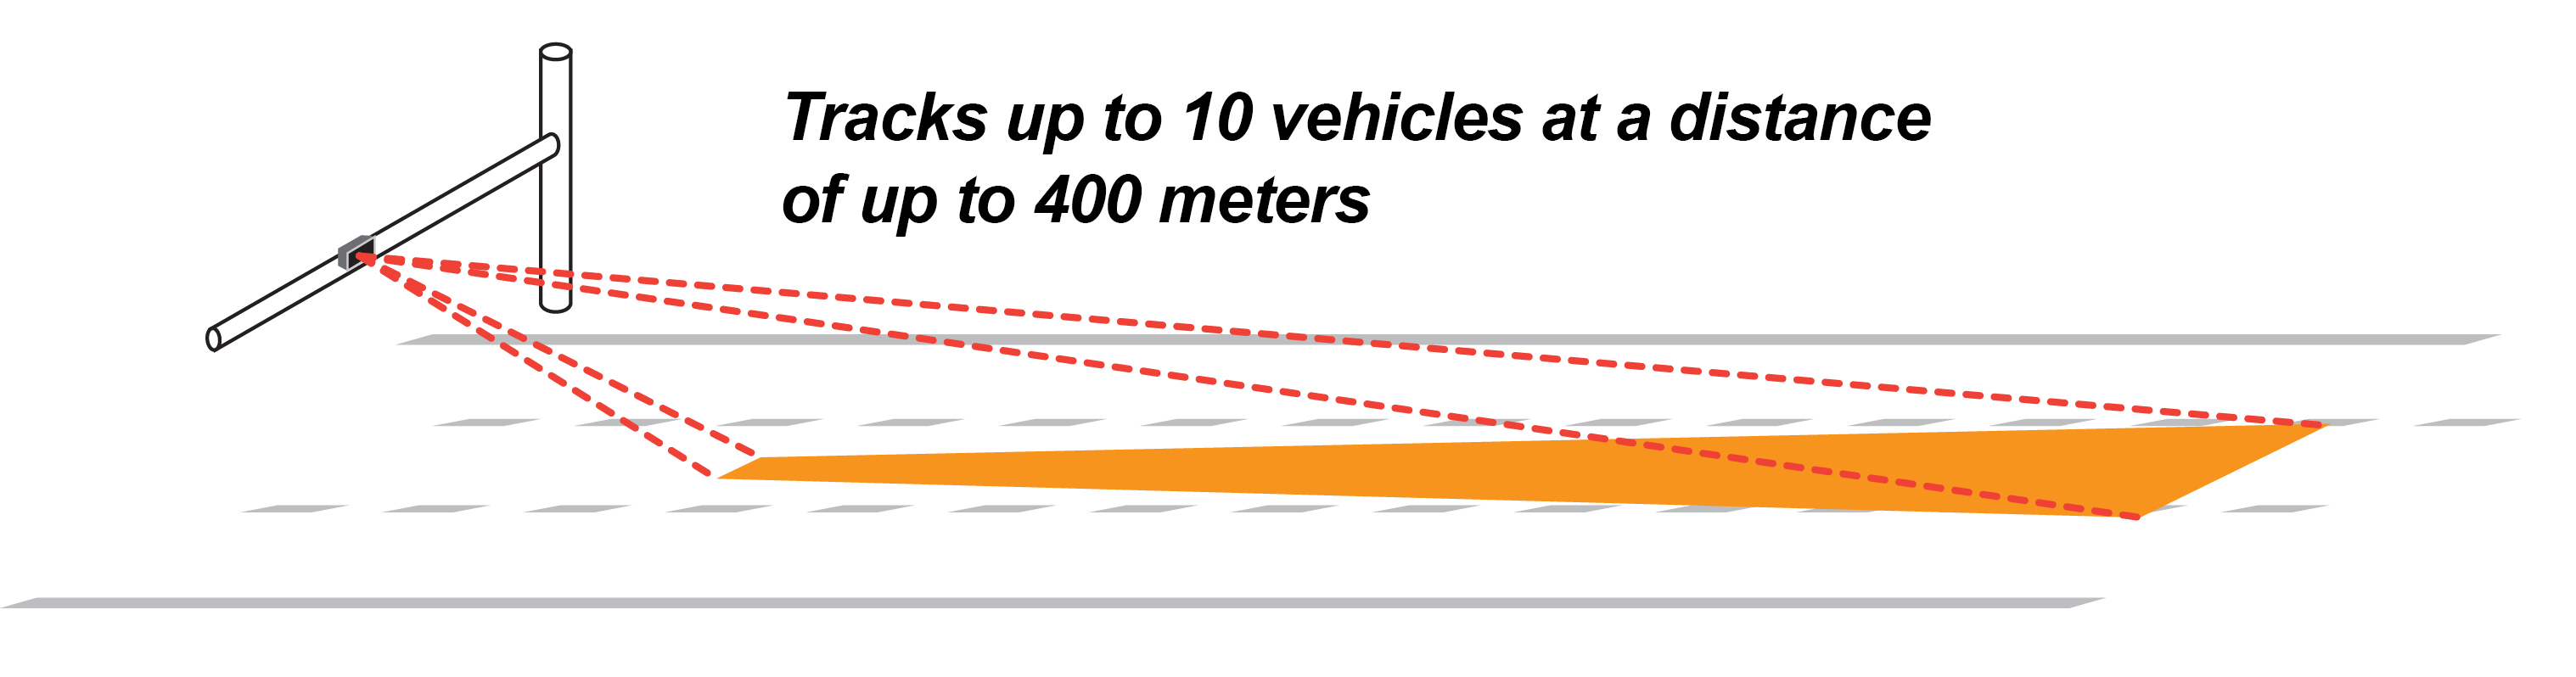 stalker radar s new stationary speed sensor ii s narrow 6 beam rh prweb com